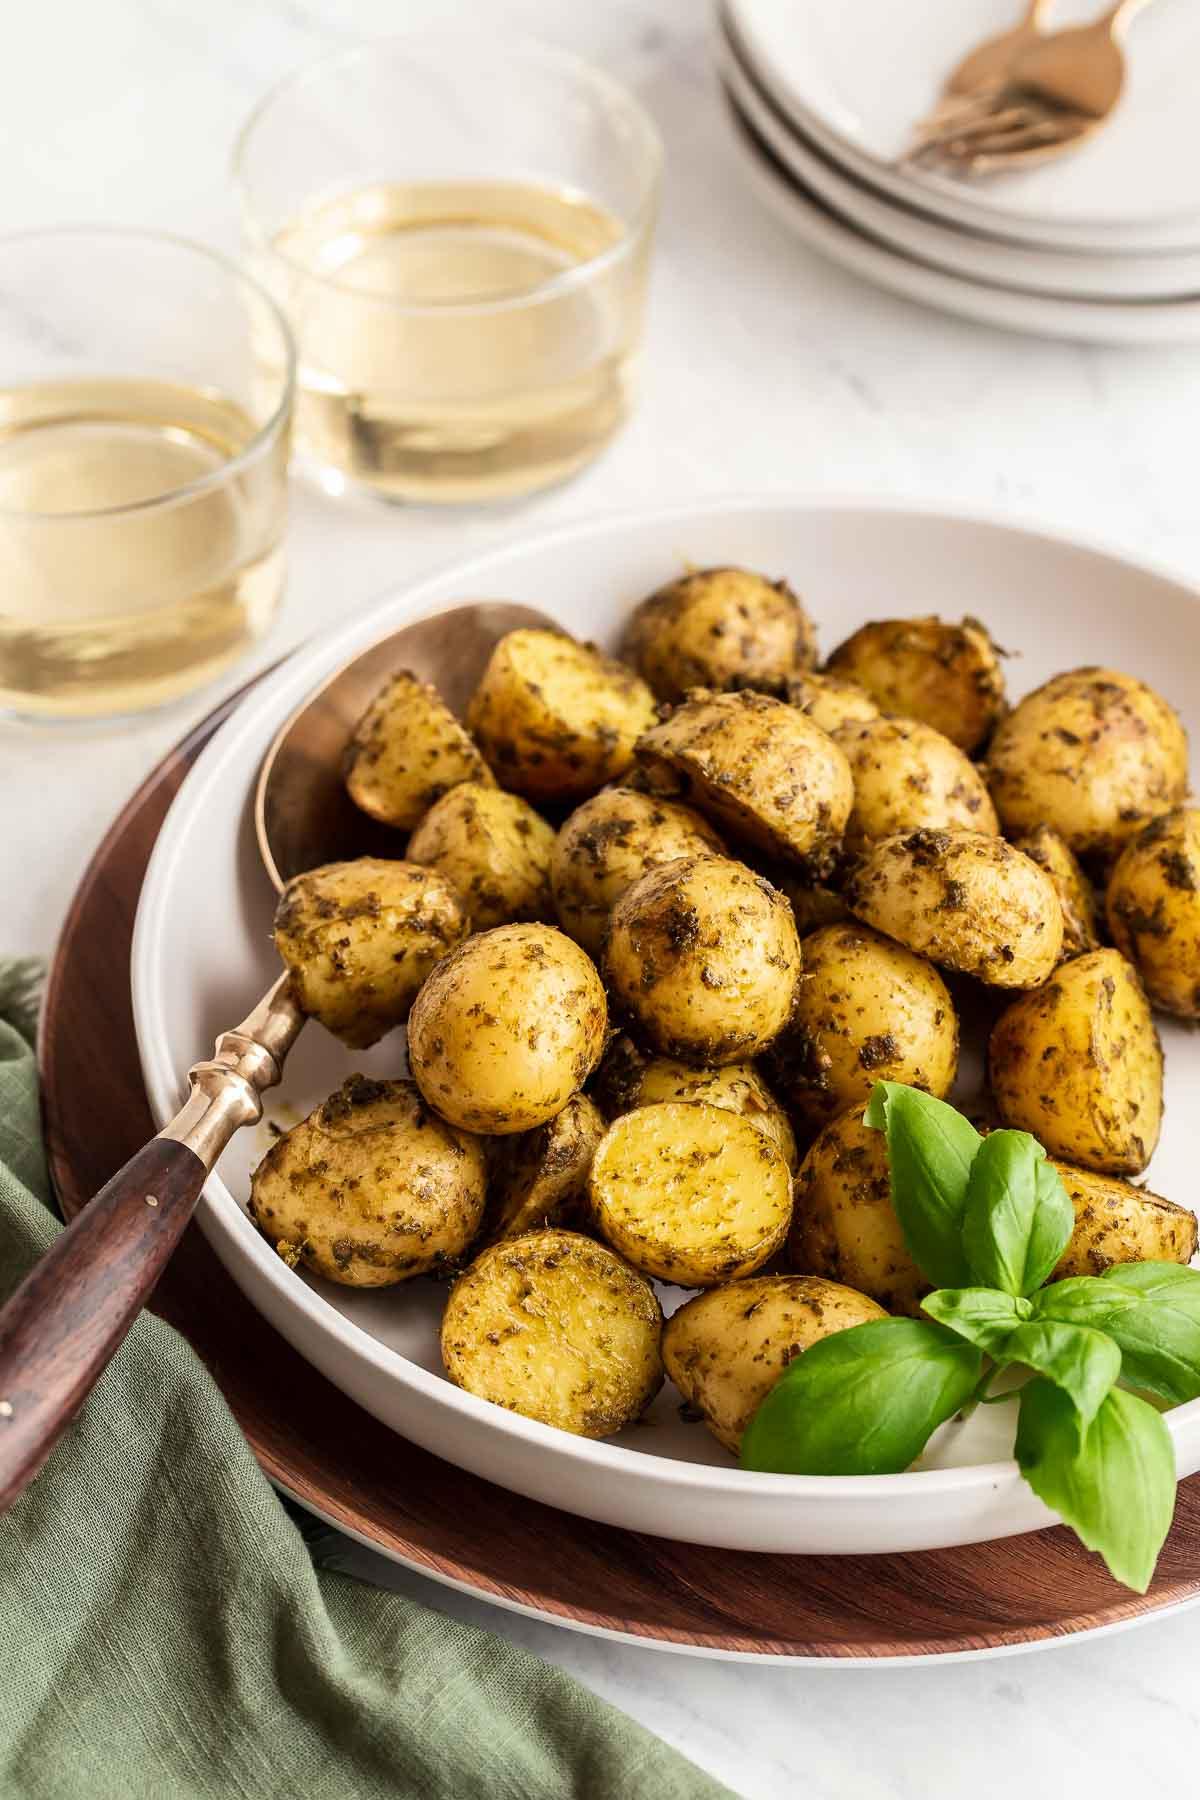 Pesto roasted potatoes in a white bowl.